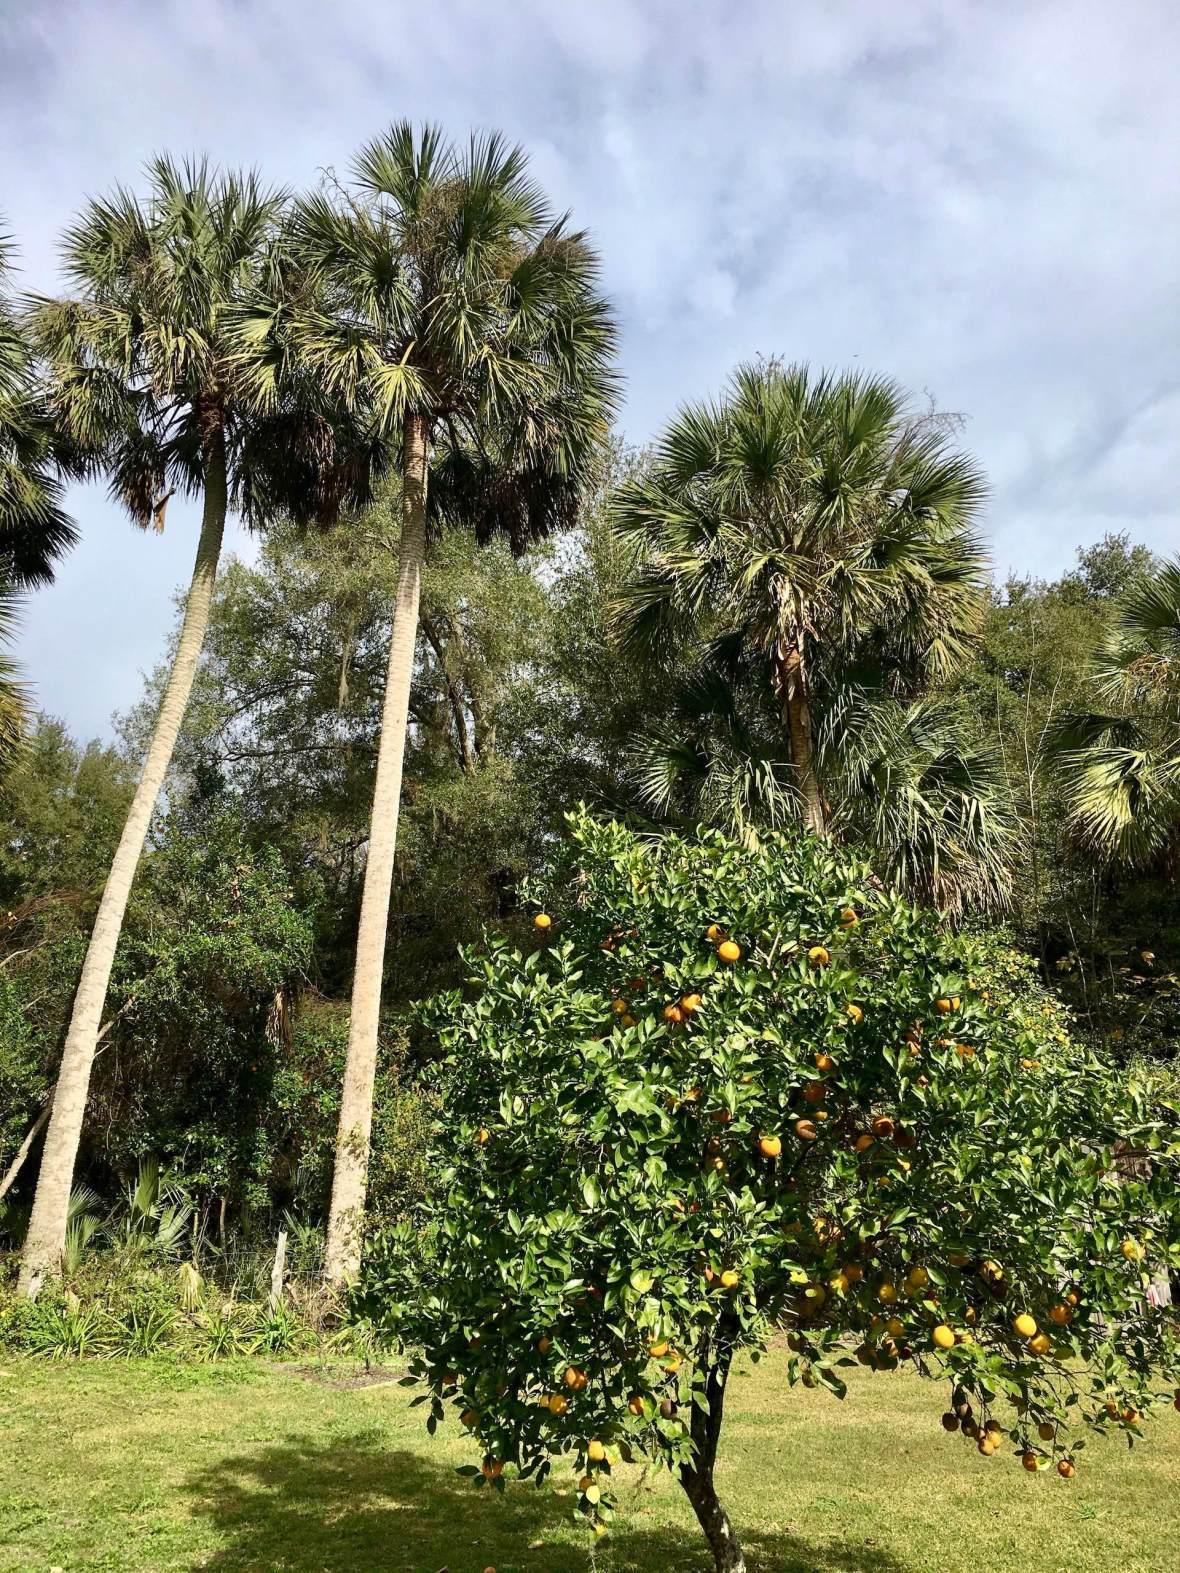 Orange Grove and Palm Trees at Marjorie Kinnan Rawlings homestead, Cross Creek Florida